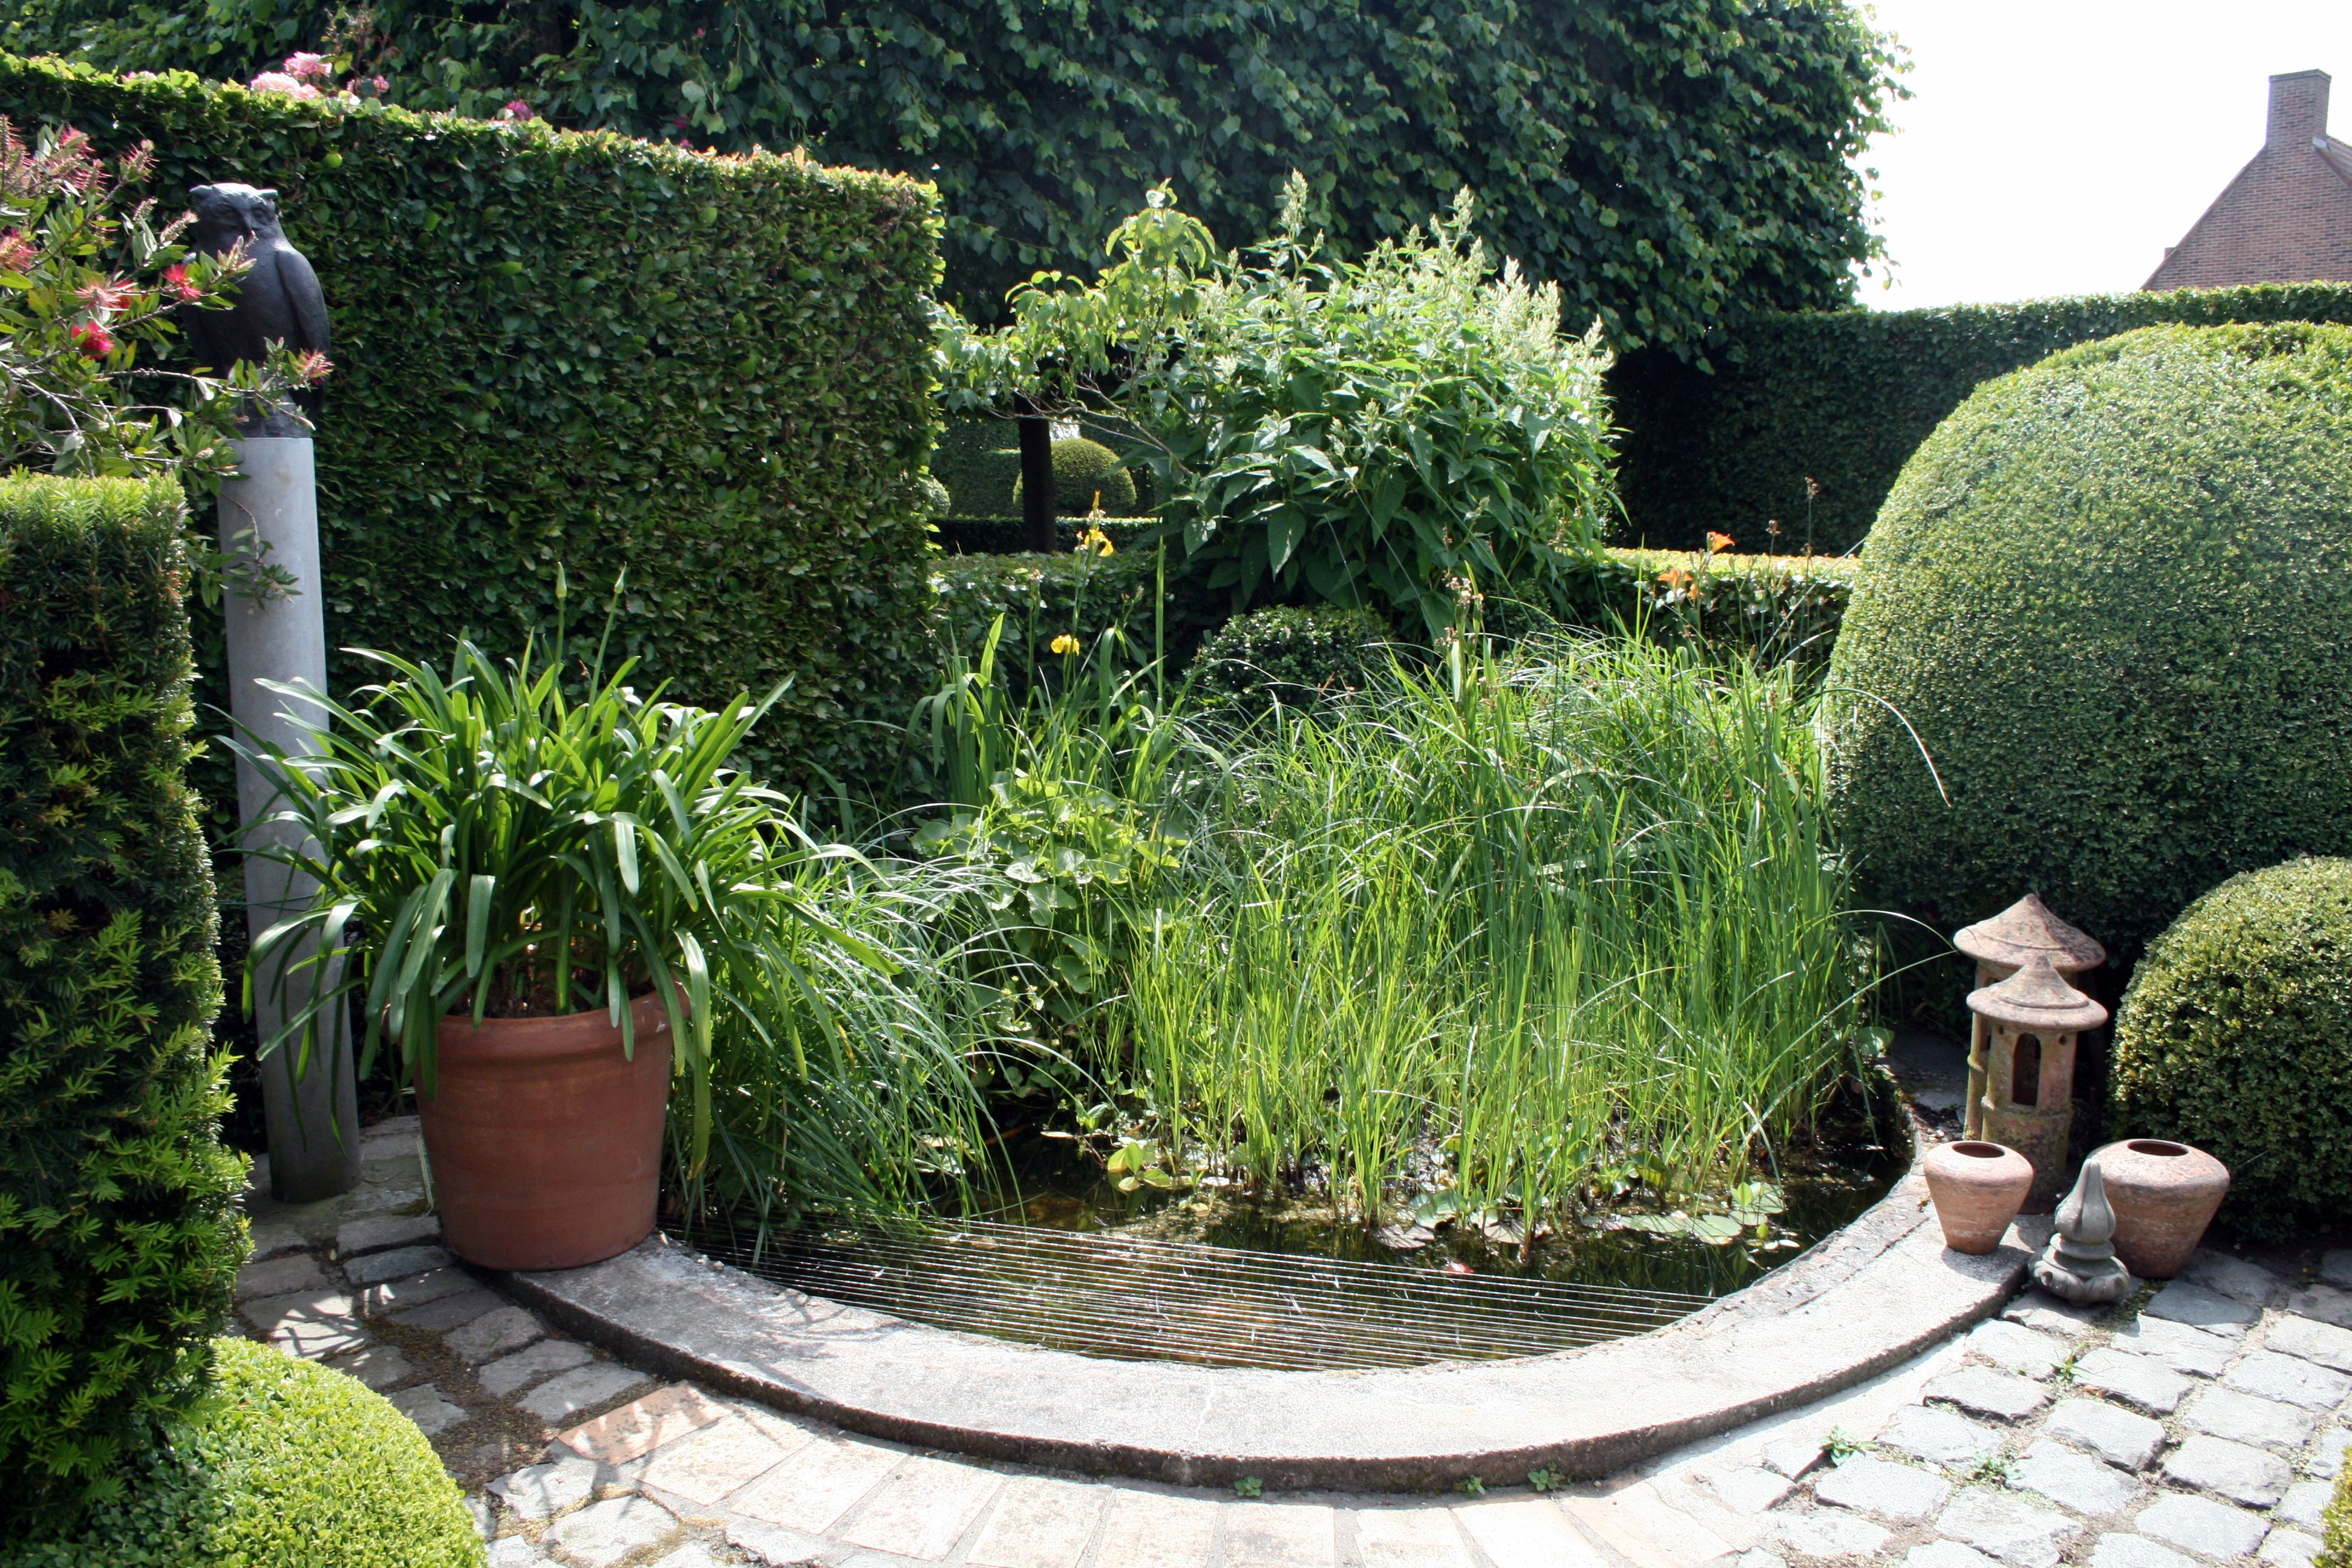 Formschnitt Topfgarten Wasser Im Garten Gartenreise Belgien Holland Tr